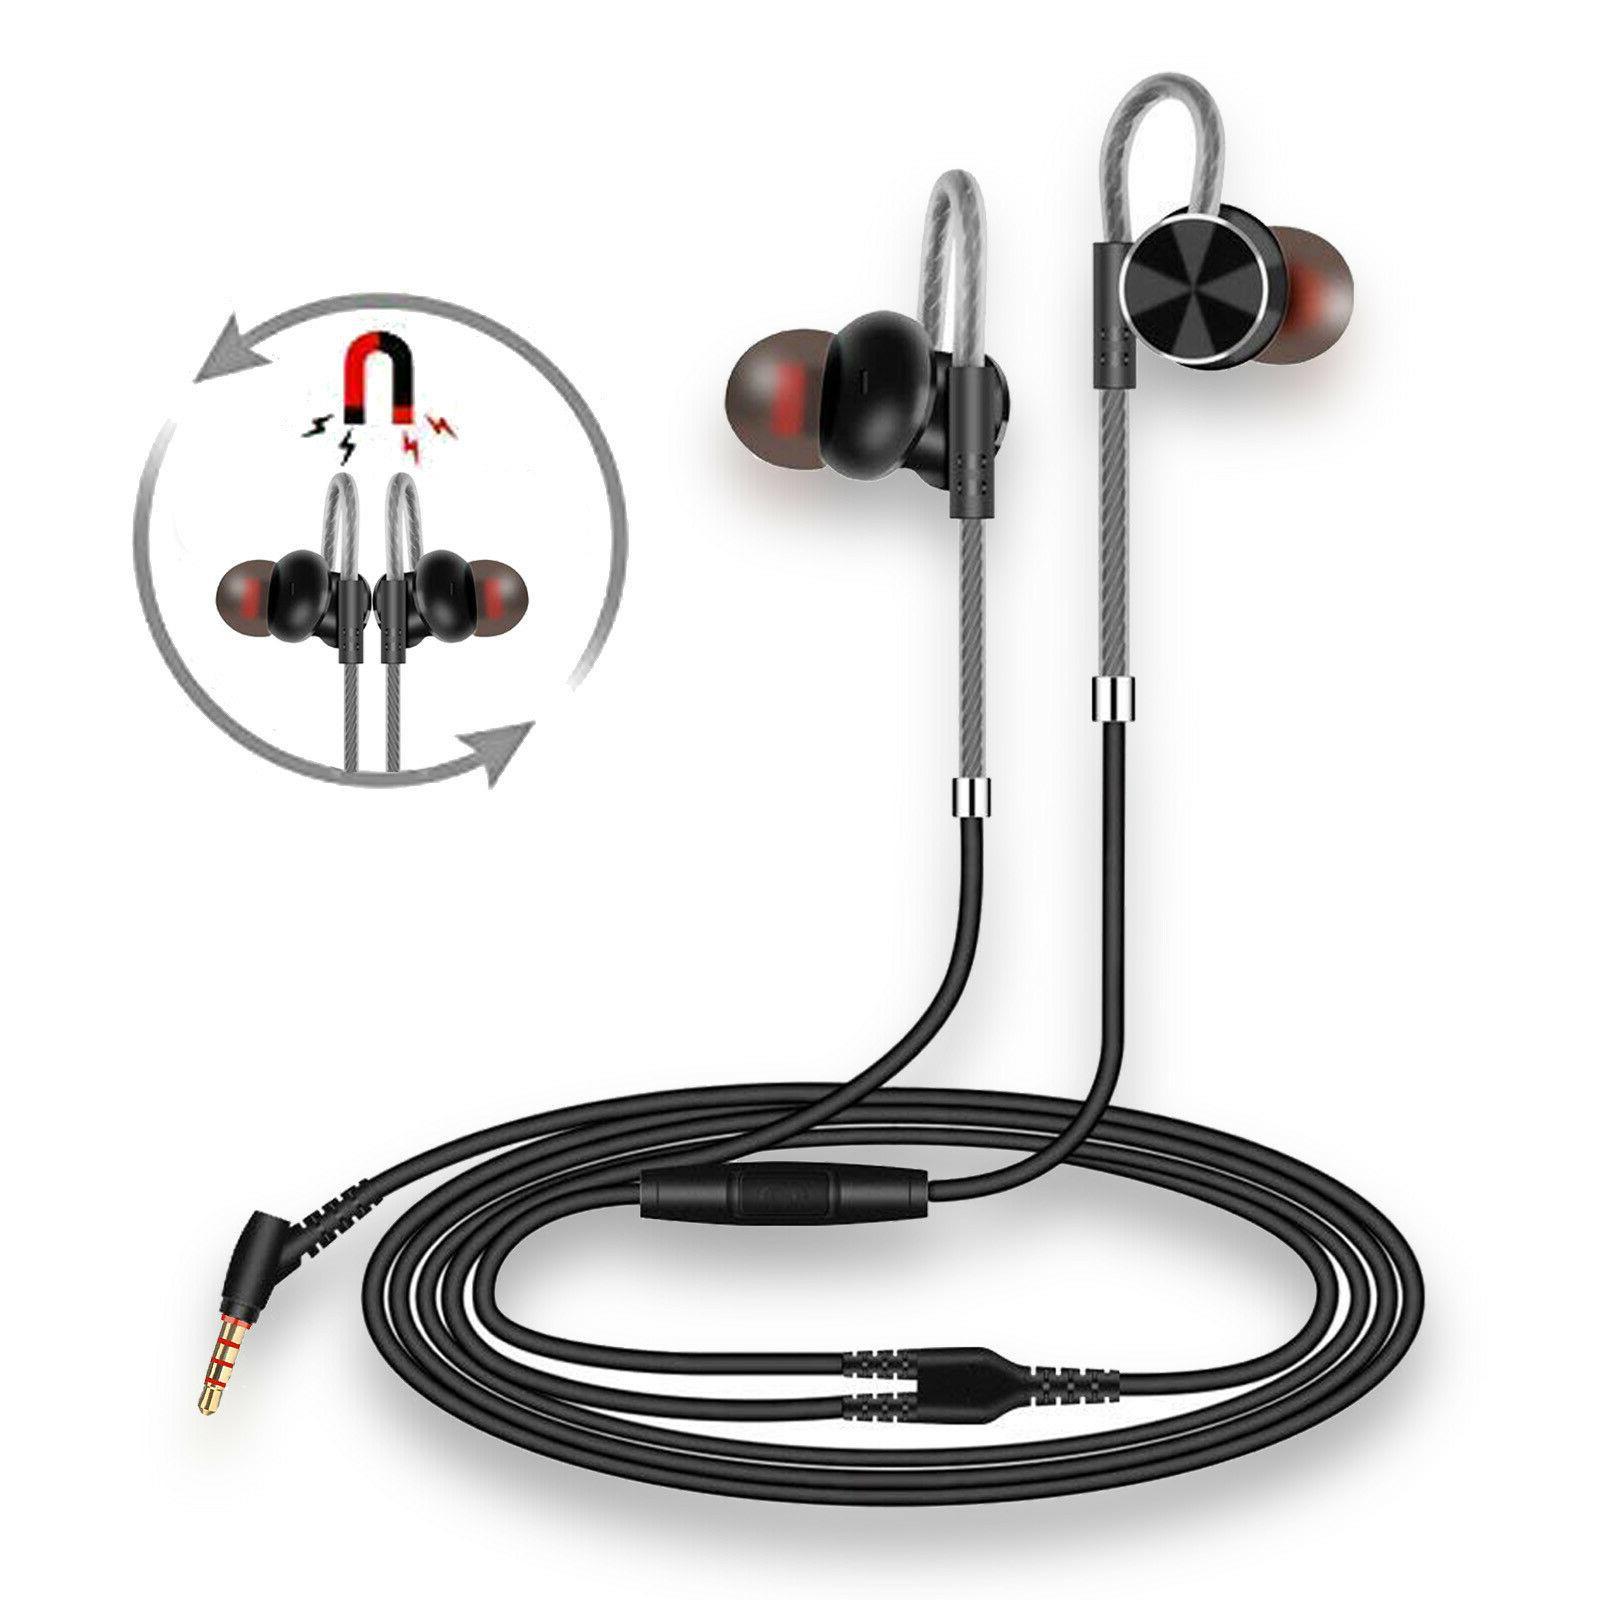 Magnetic In-Ear Earphone Stereo Wired Earbuds Mic Headphone